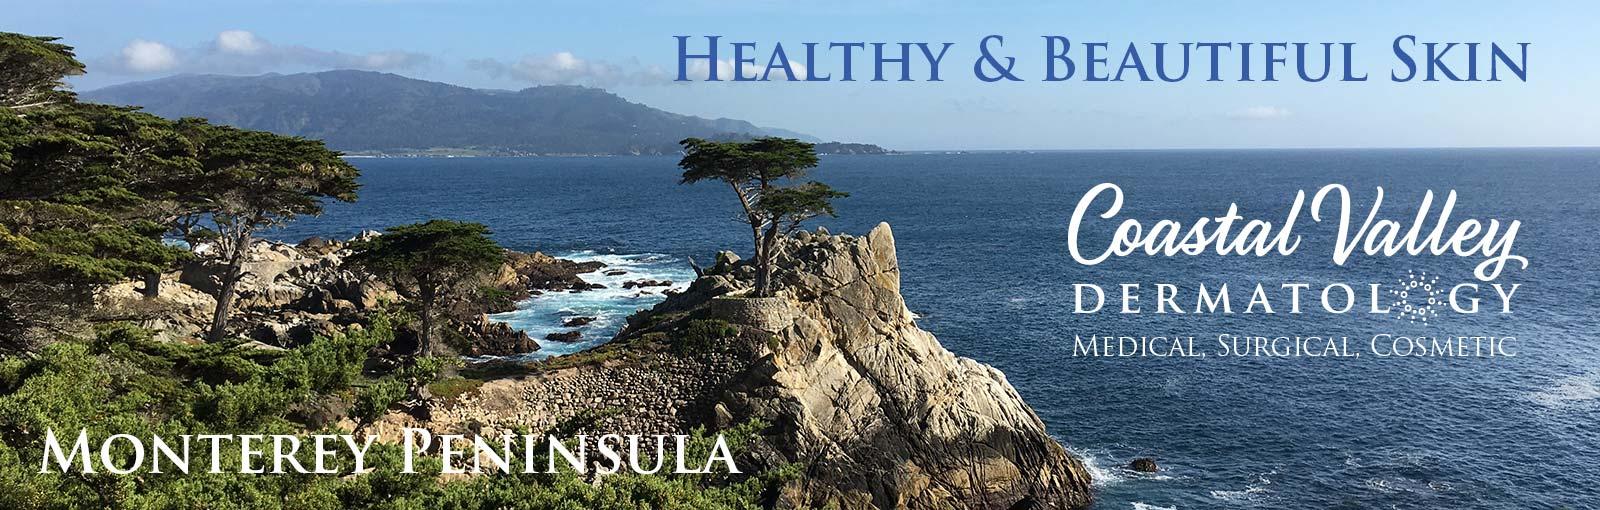 coastal-valley-dermatology-carmel-skin-healthy-beautiful-photo